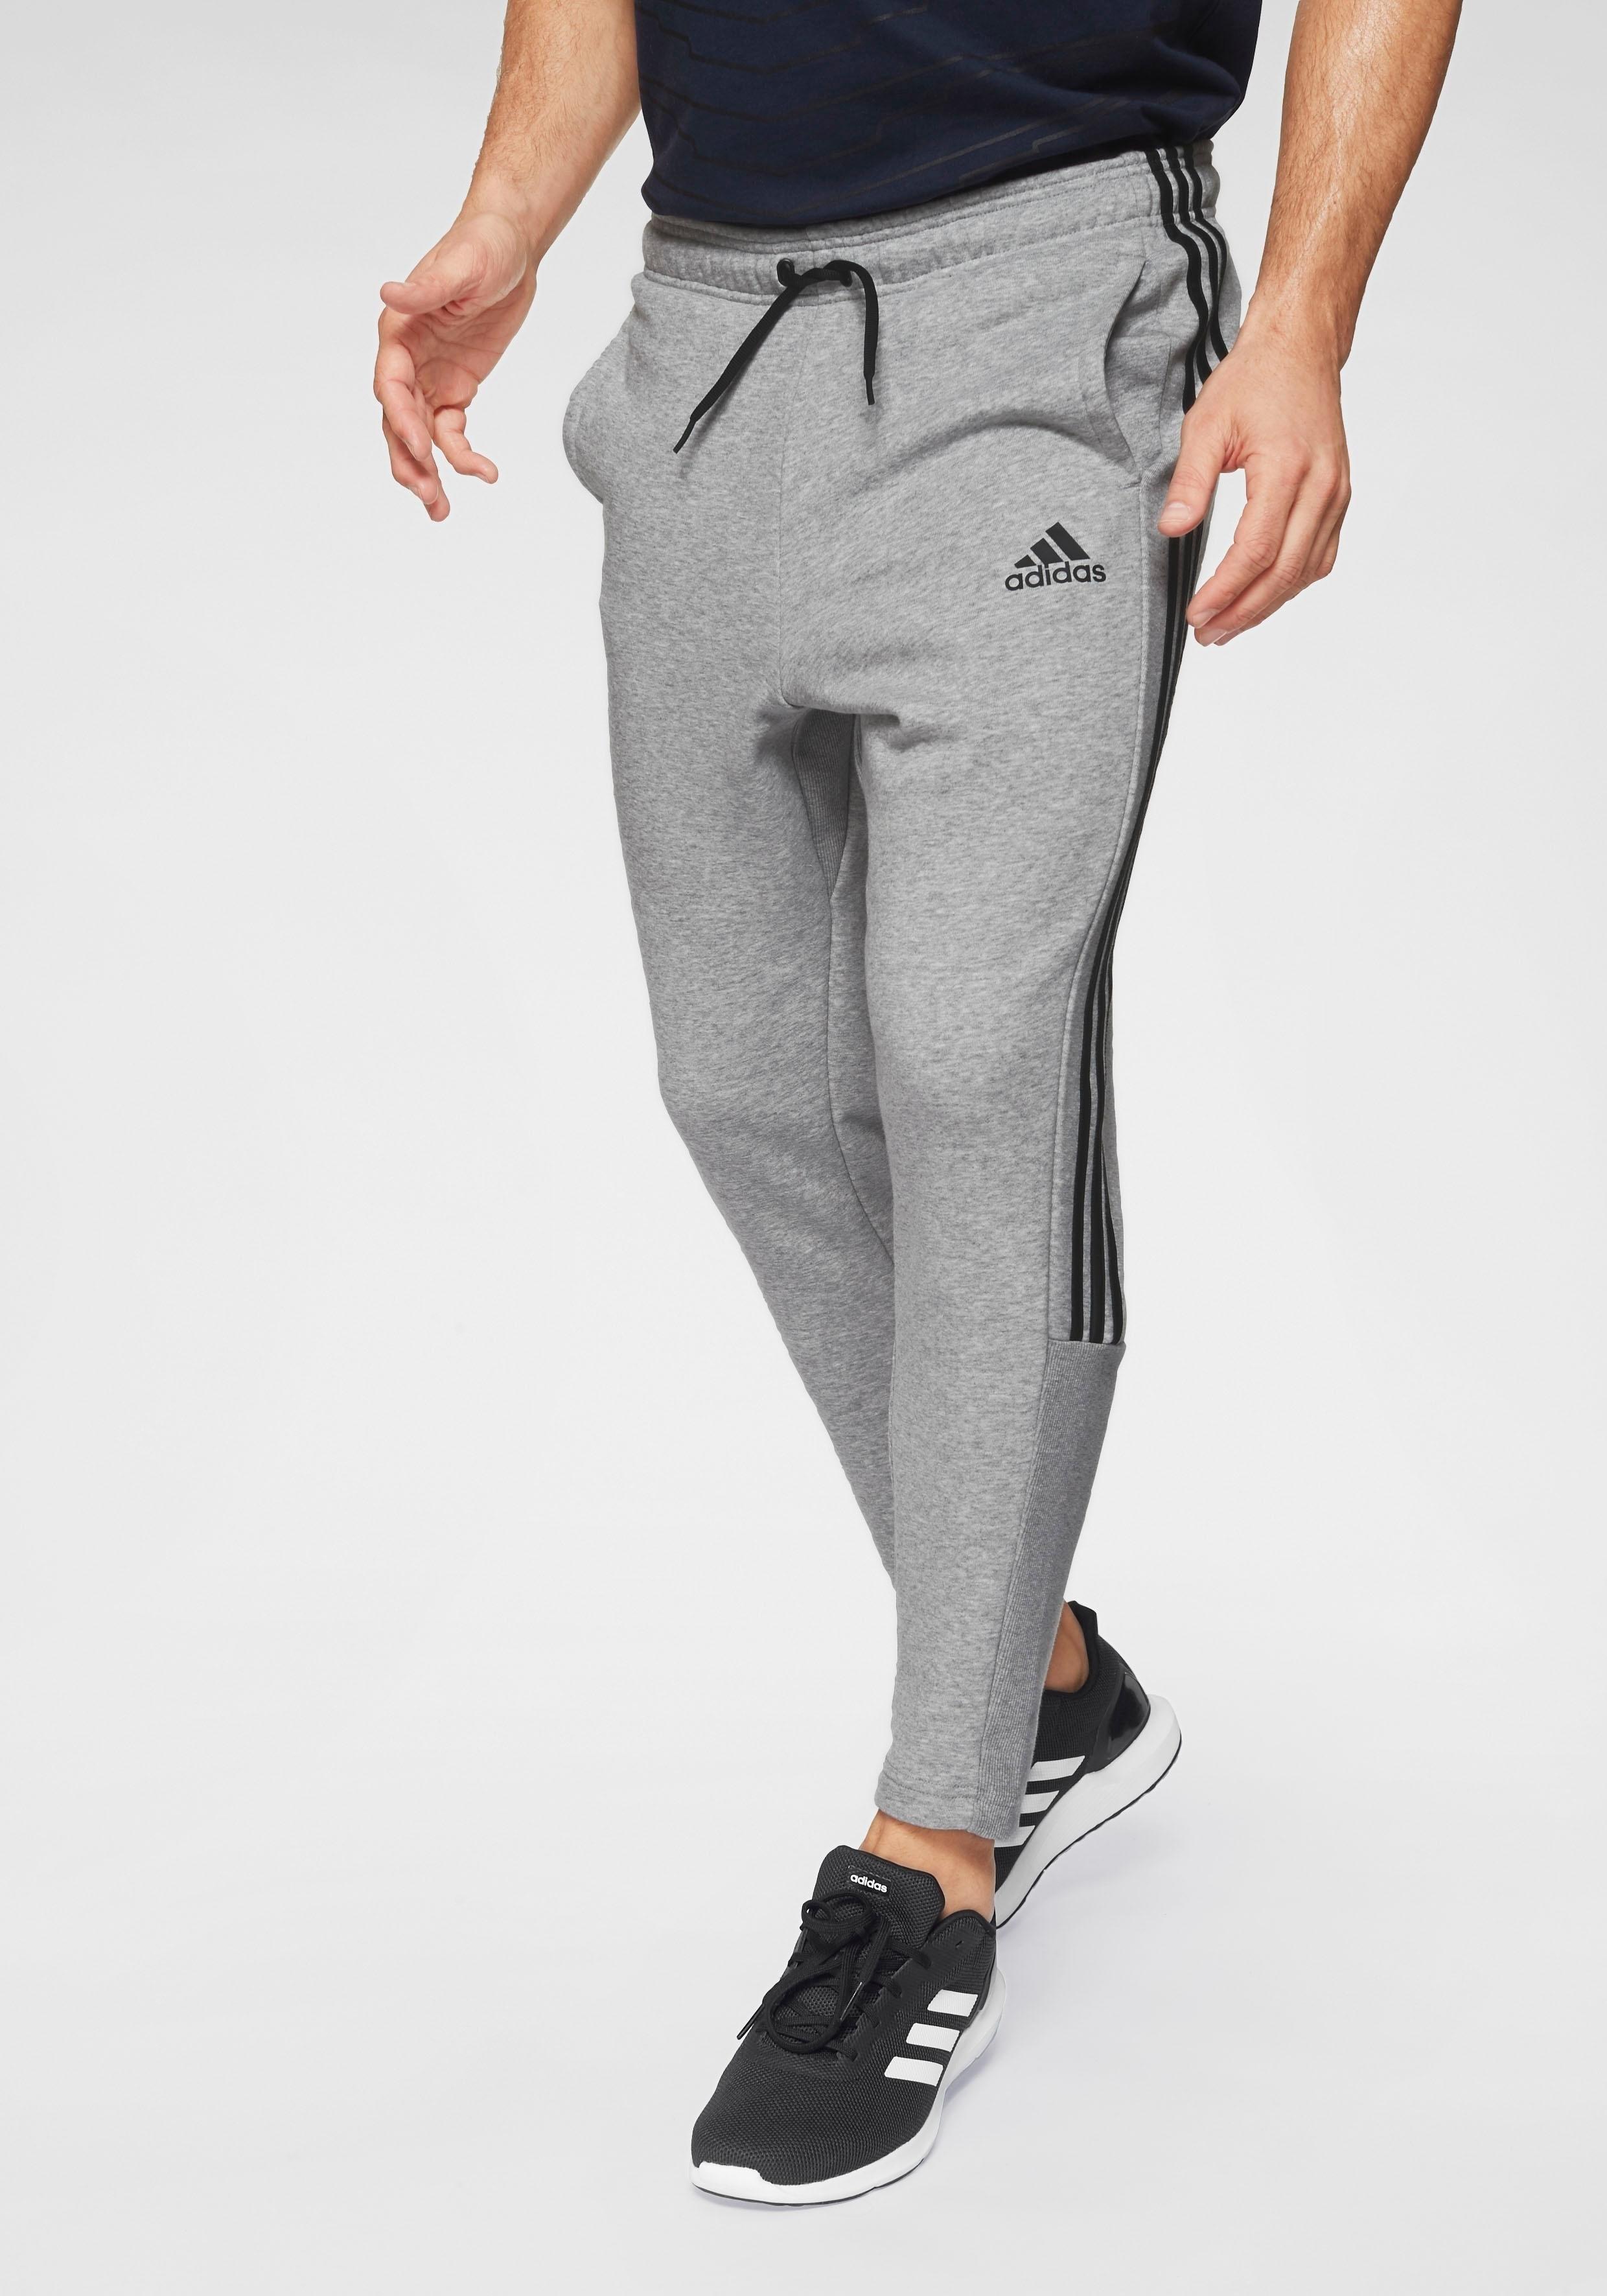 adidas Performance joggingbroek »MH 3 STRIPES TRIO PANT FT« nu online kopen bij OTTO